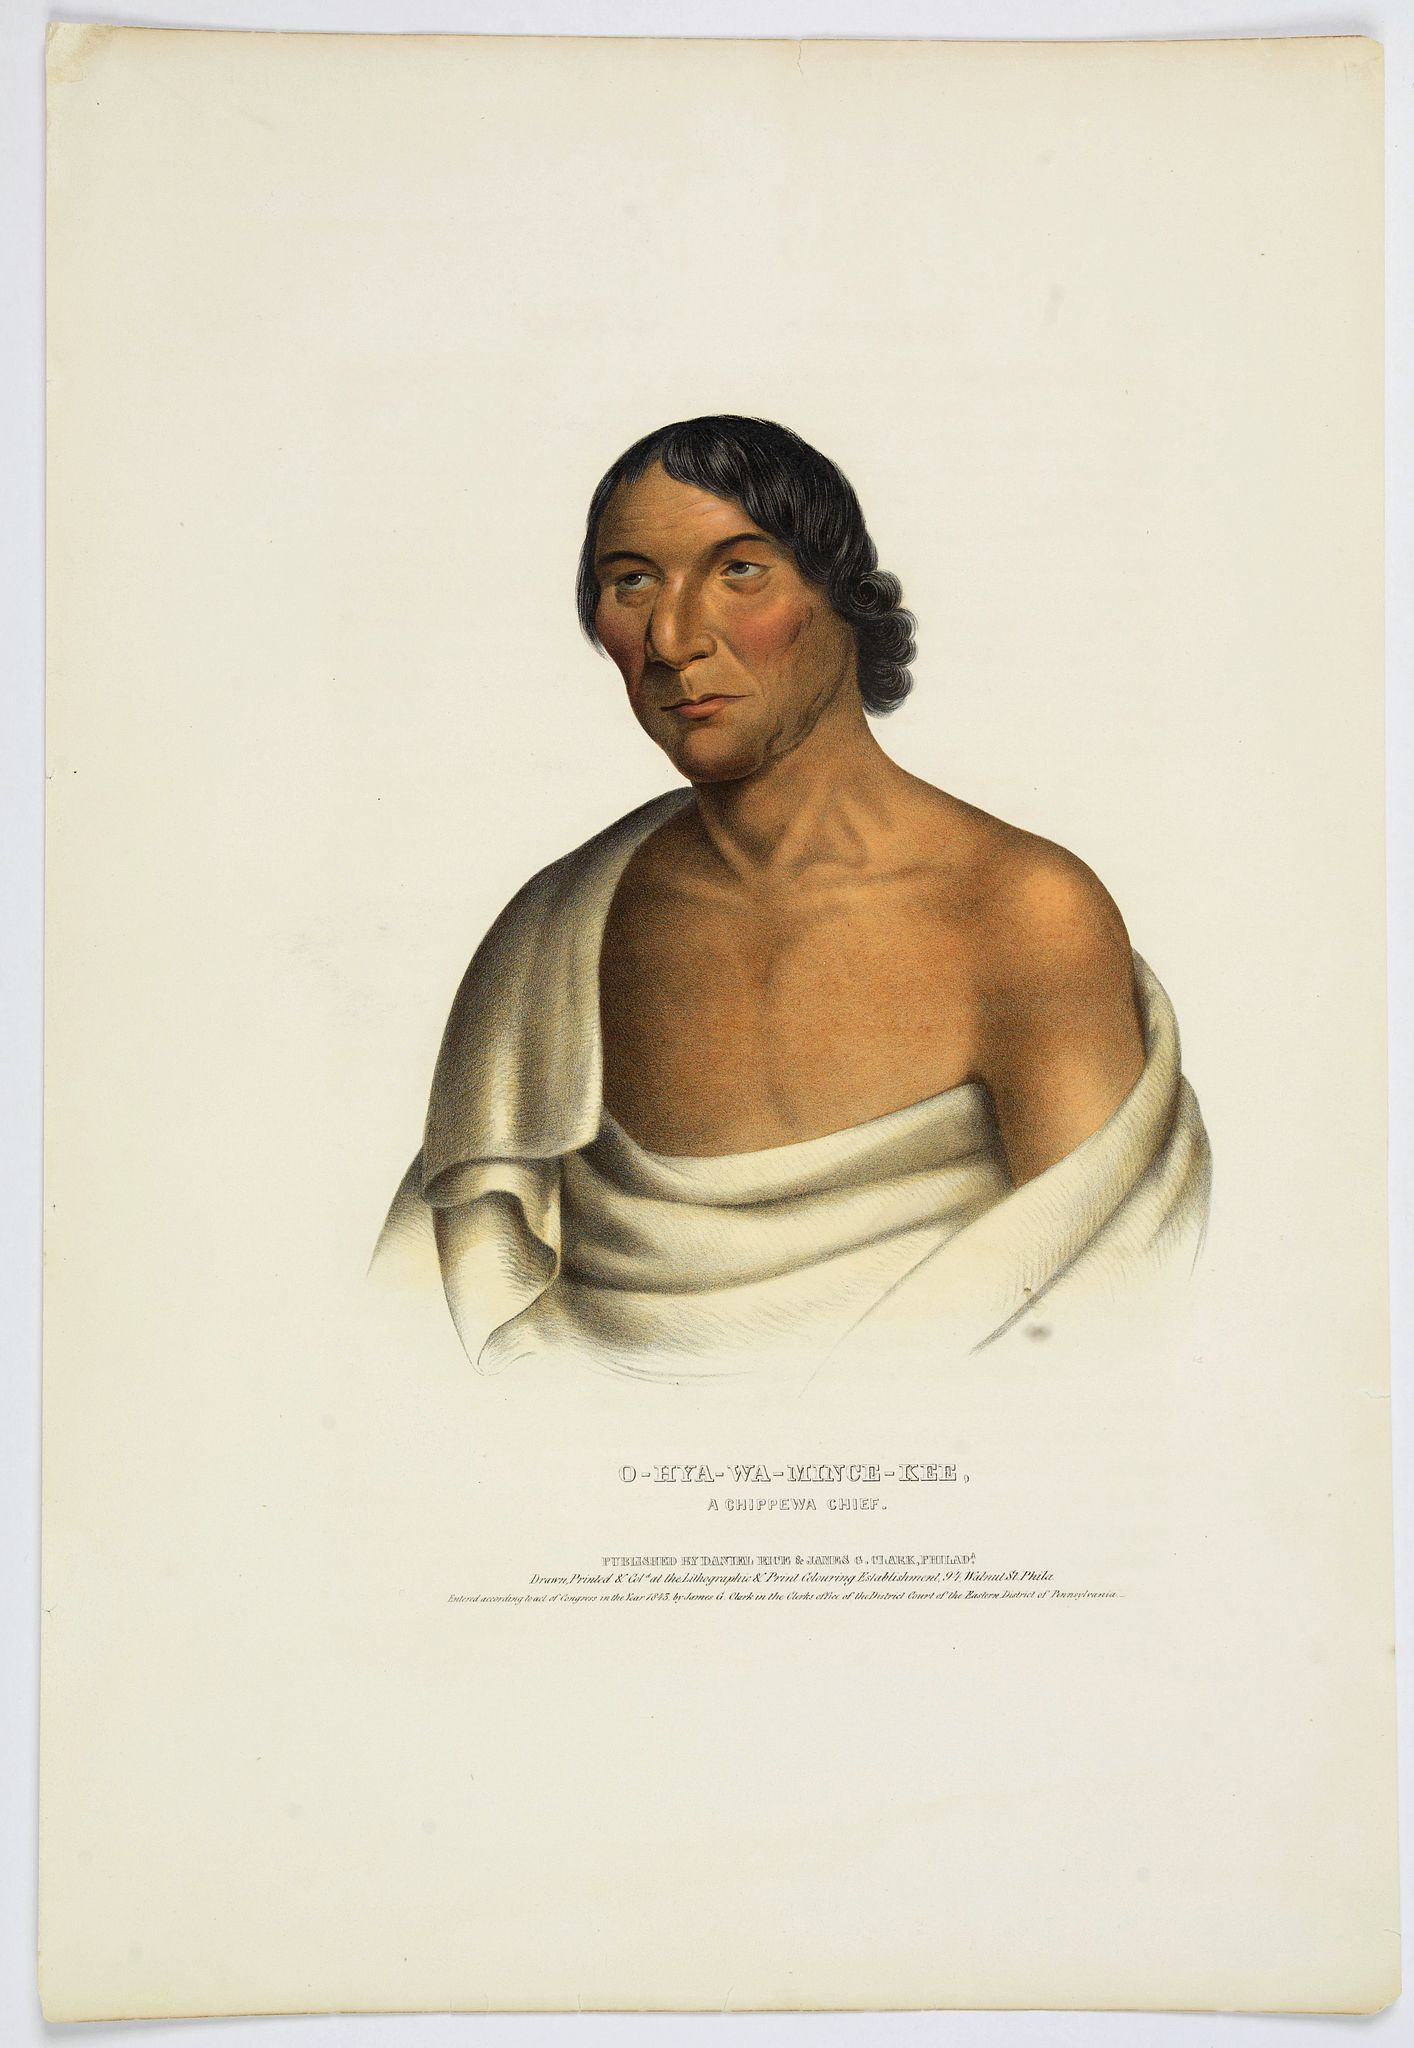 MCKENNEY, T & HALL, J. -  O-Hya-Wa-Mince-Kee. A Chippewa Chief.